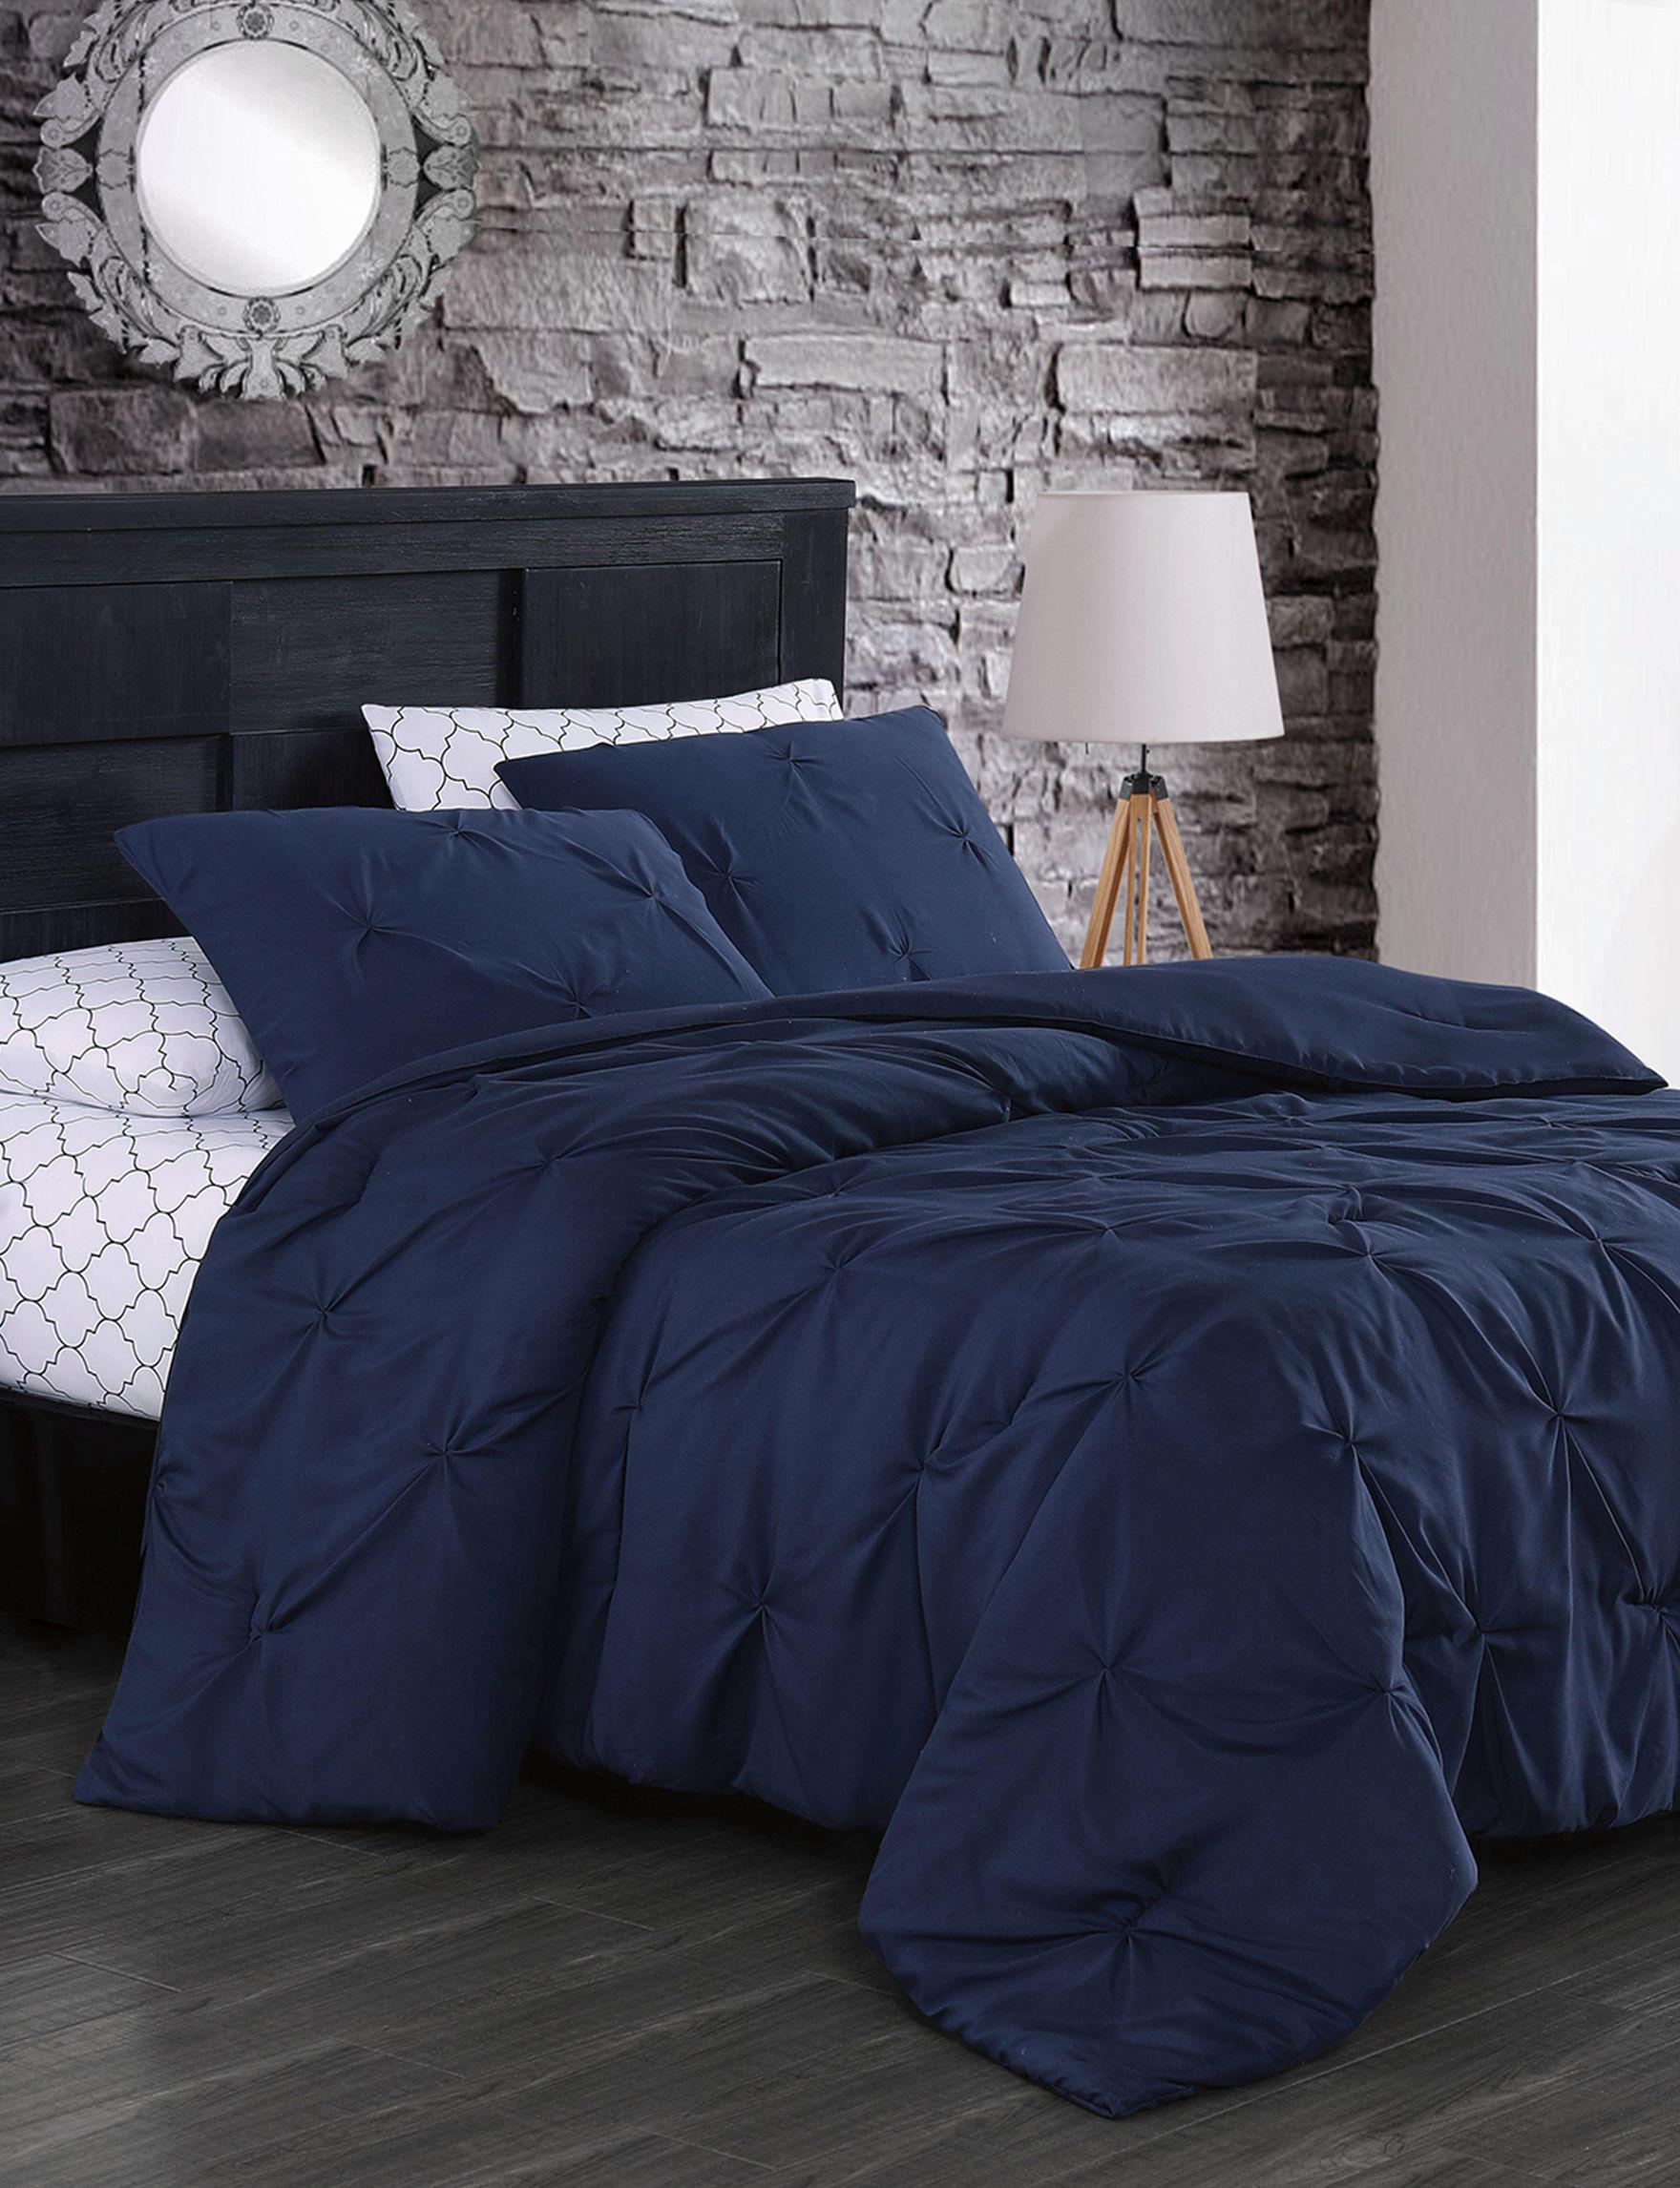 Avondale Manor Navy Comforters & Comforter Sets